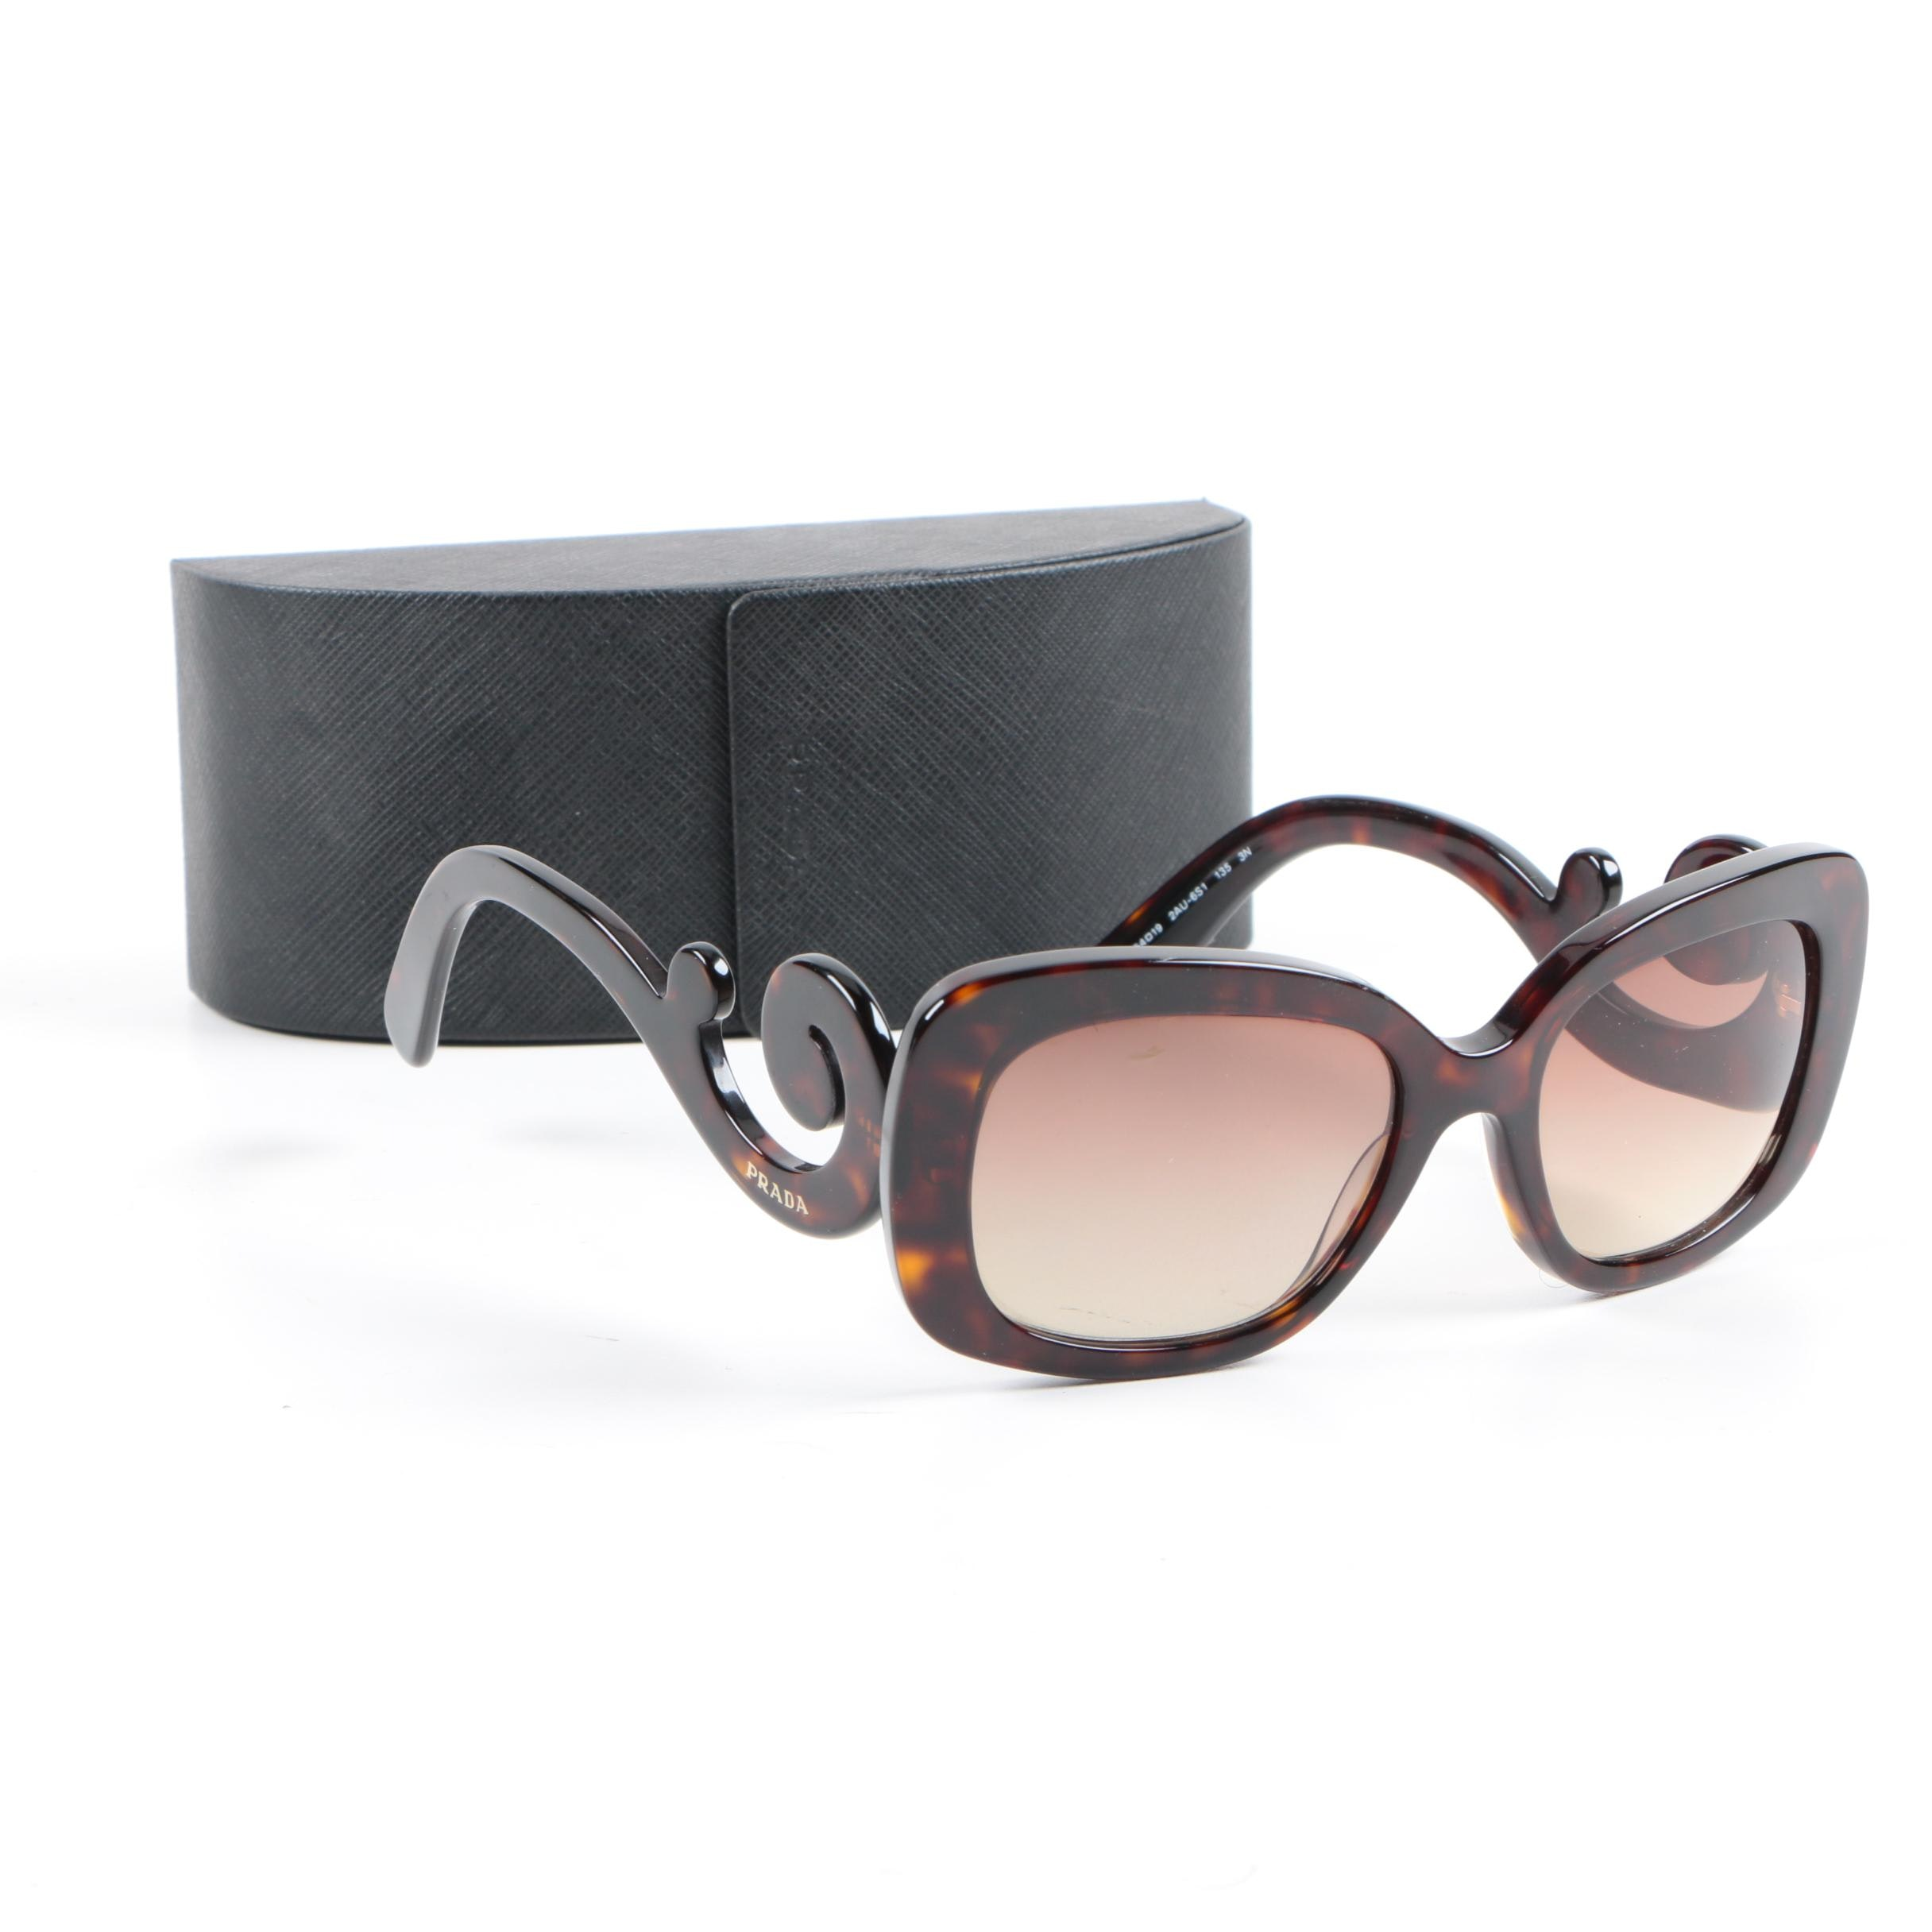 Prada Prescription Sunglasses with Case